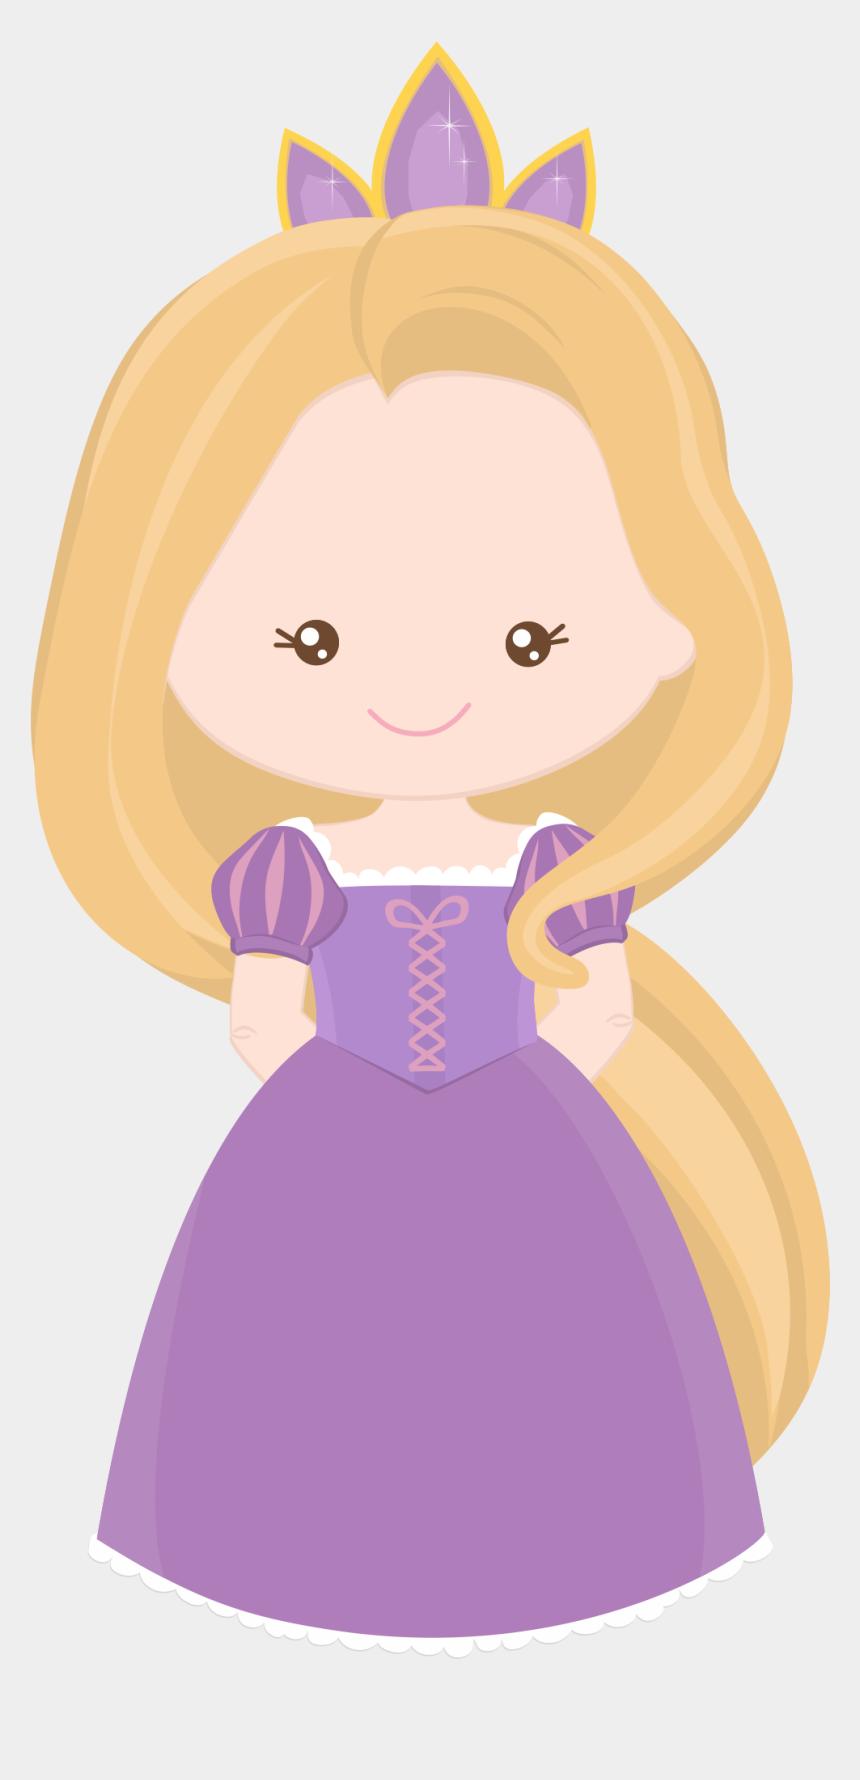 rapunzel clipart, Cartoons - Rapunzel, Disney Movie Characters, Disney Movies, Majo, - Princess Rapunzel Clipart